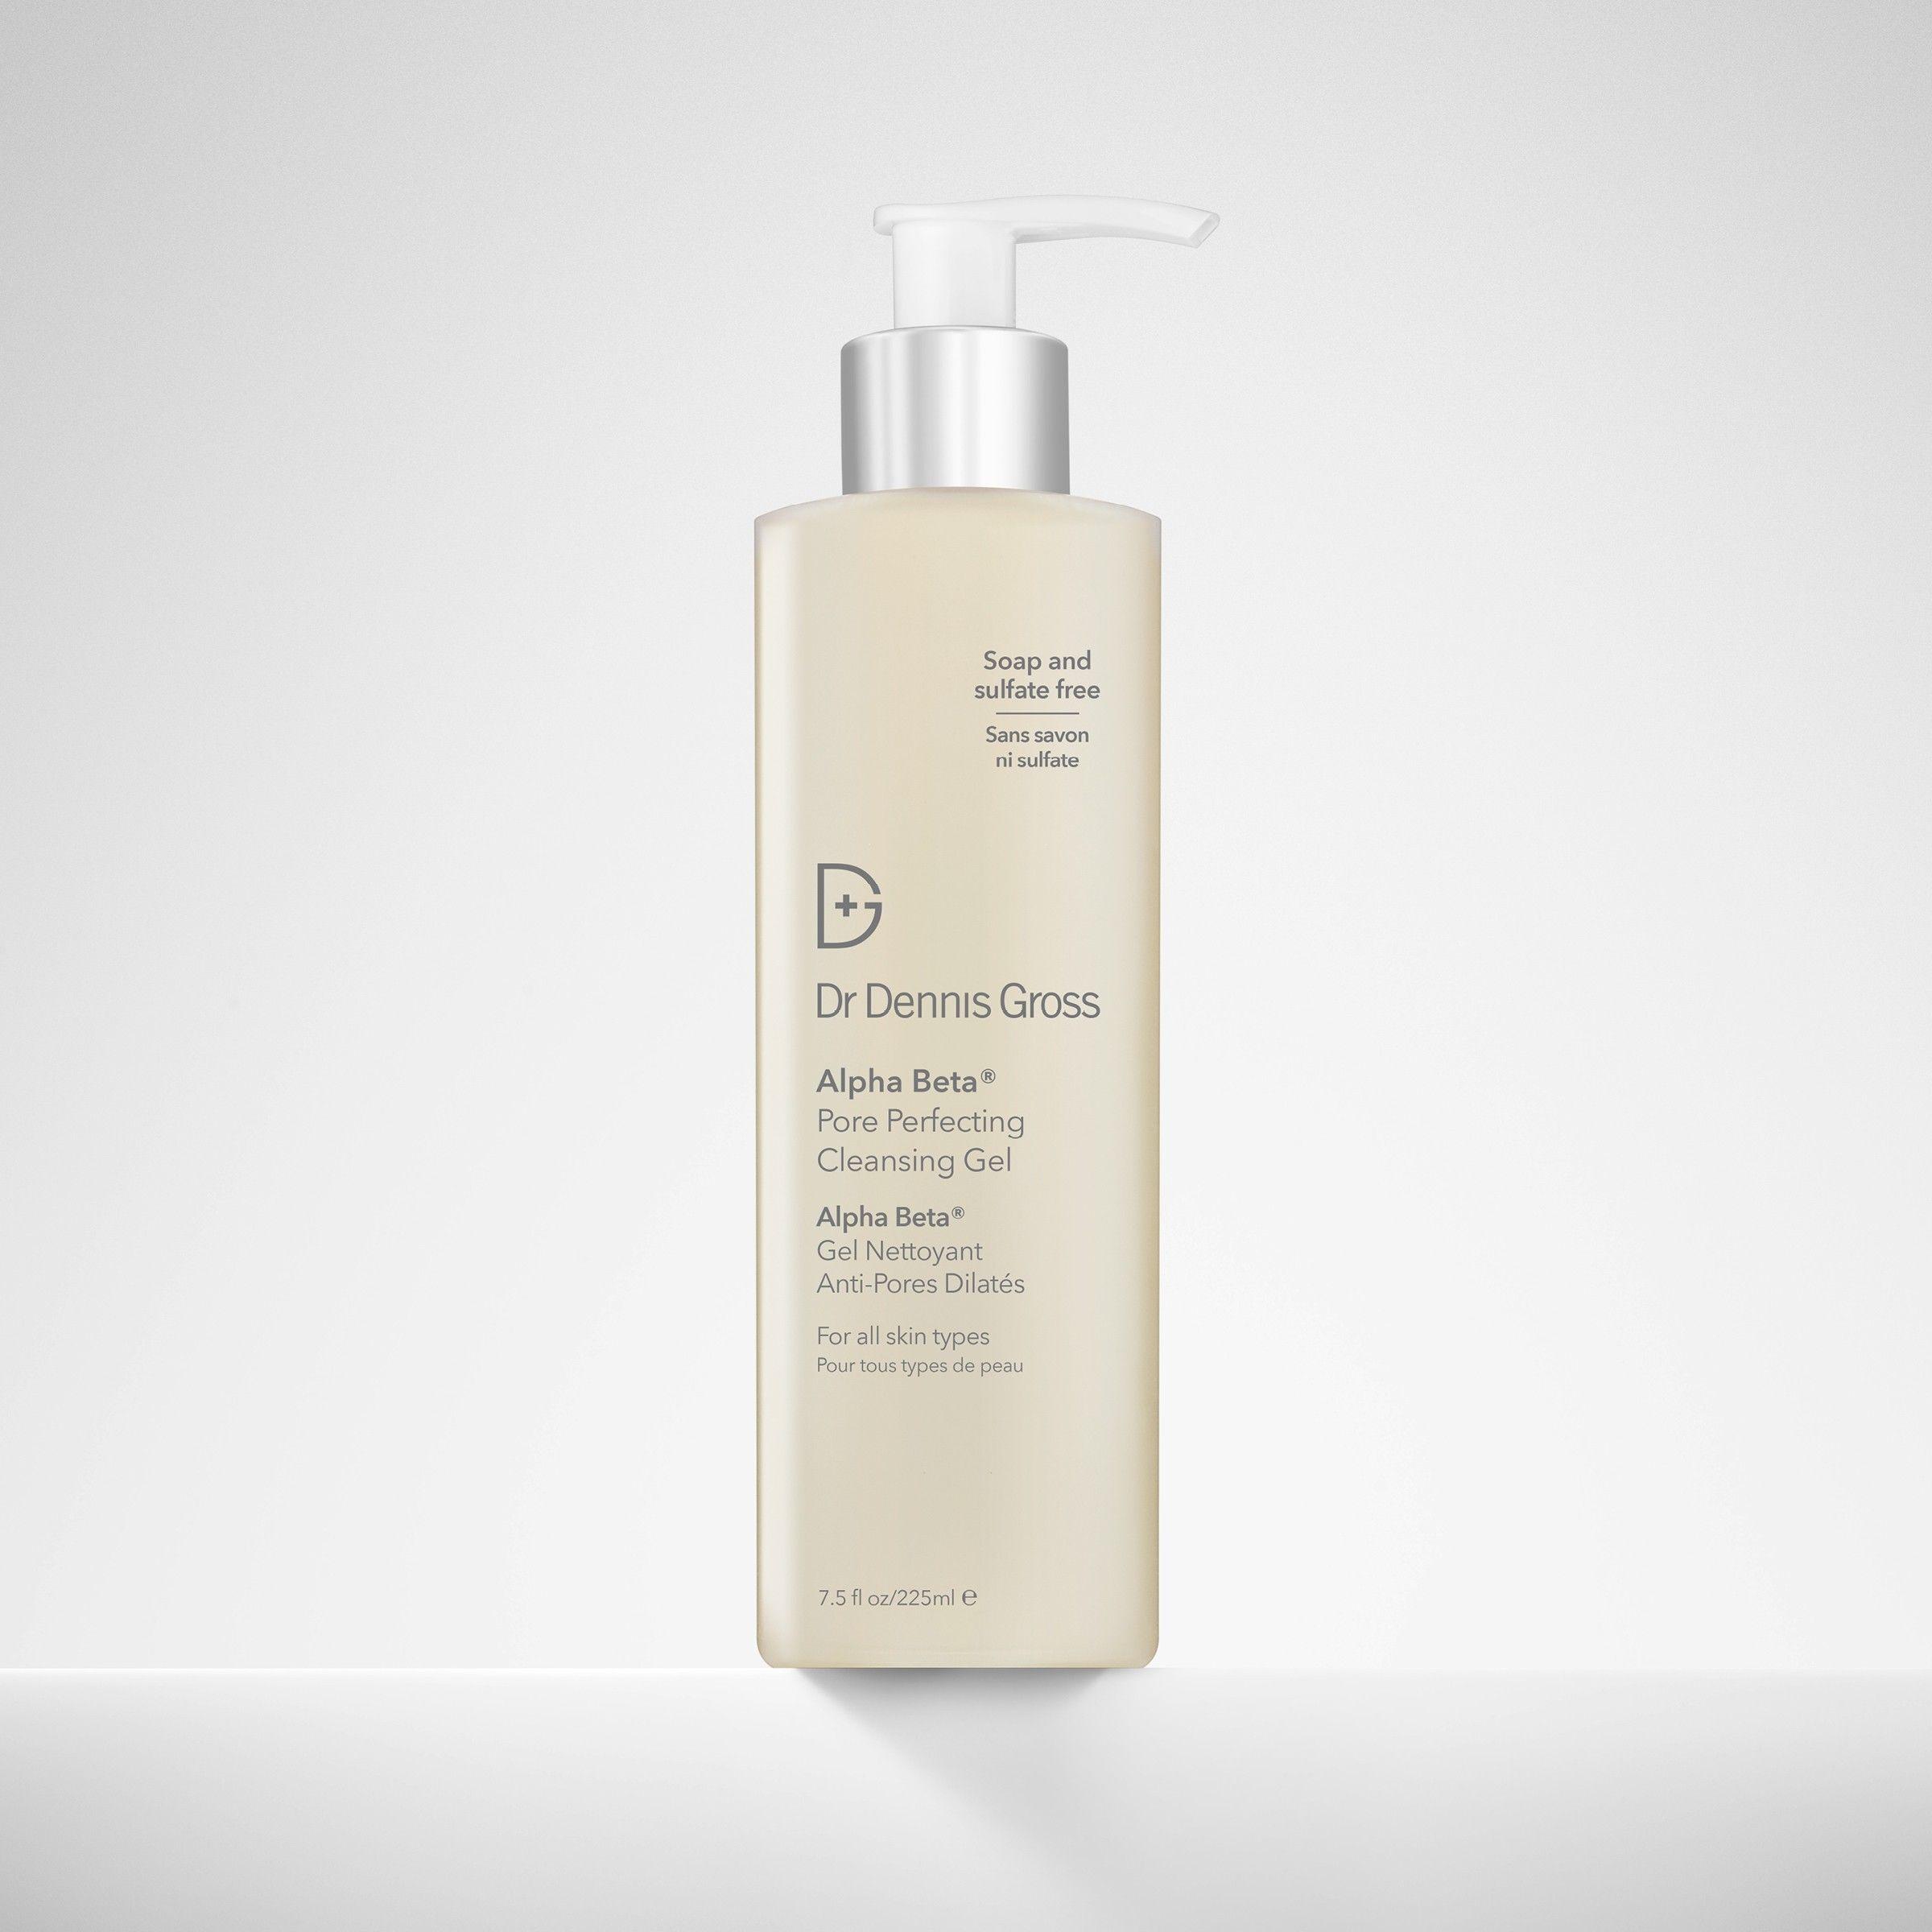 Alpha+Beta®+Pore+Perfecting+Cleansing+Gel Cleansing gel